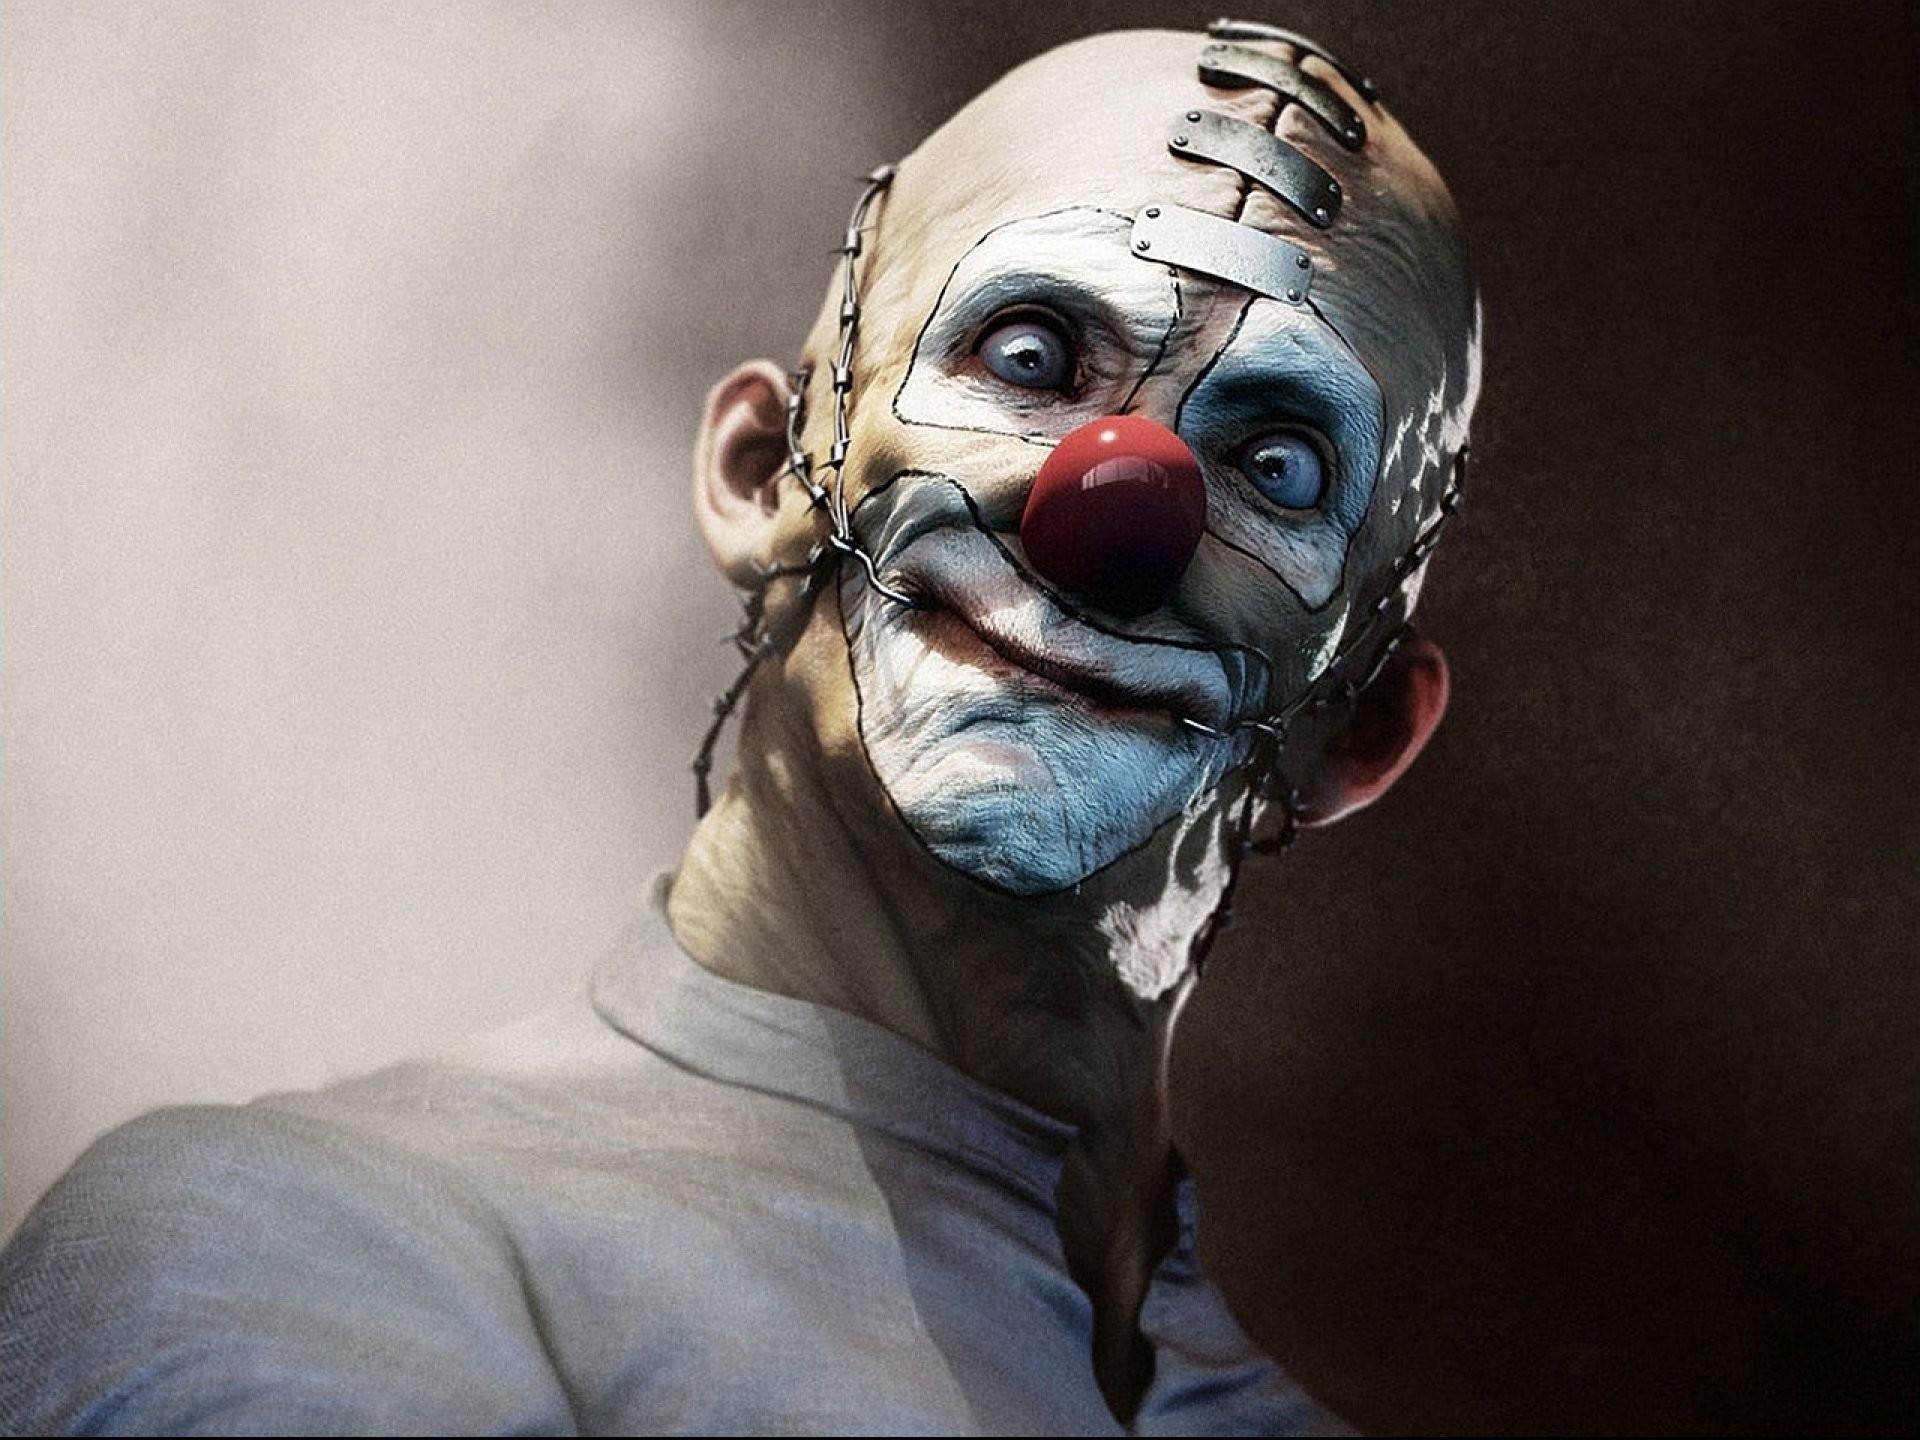 Dark horror evil clown art artwork f wallpaper | | 693581 .